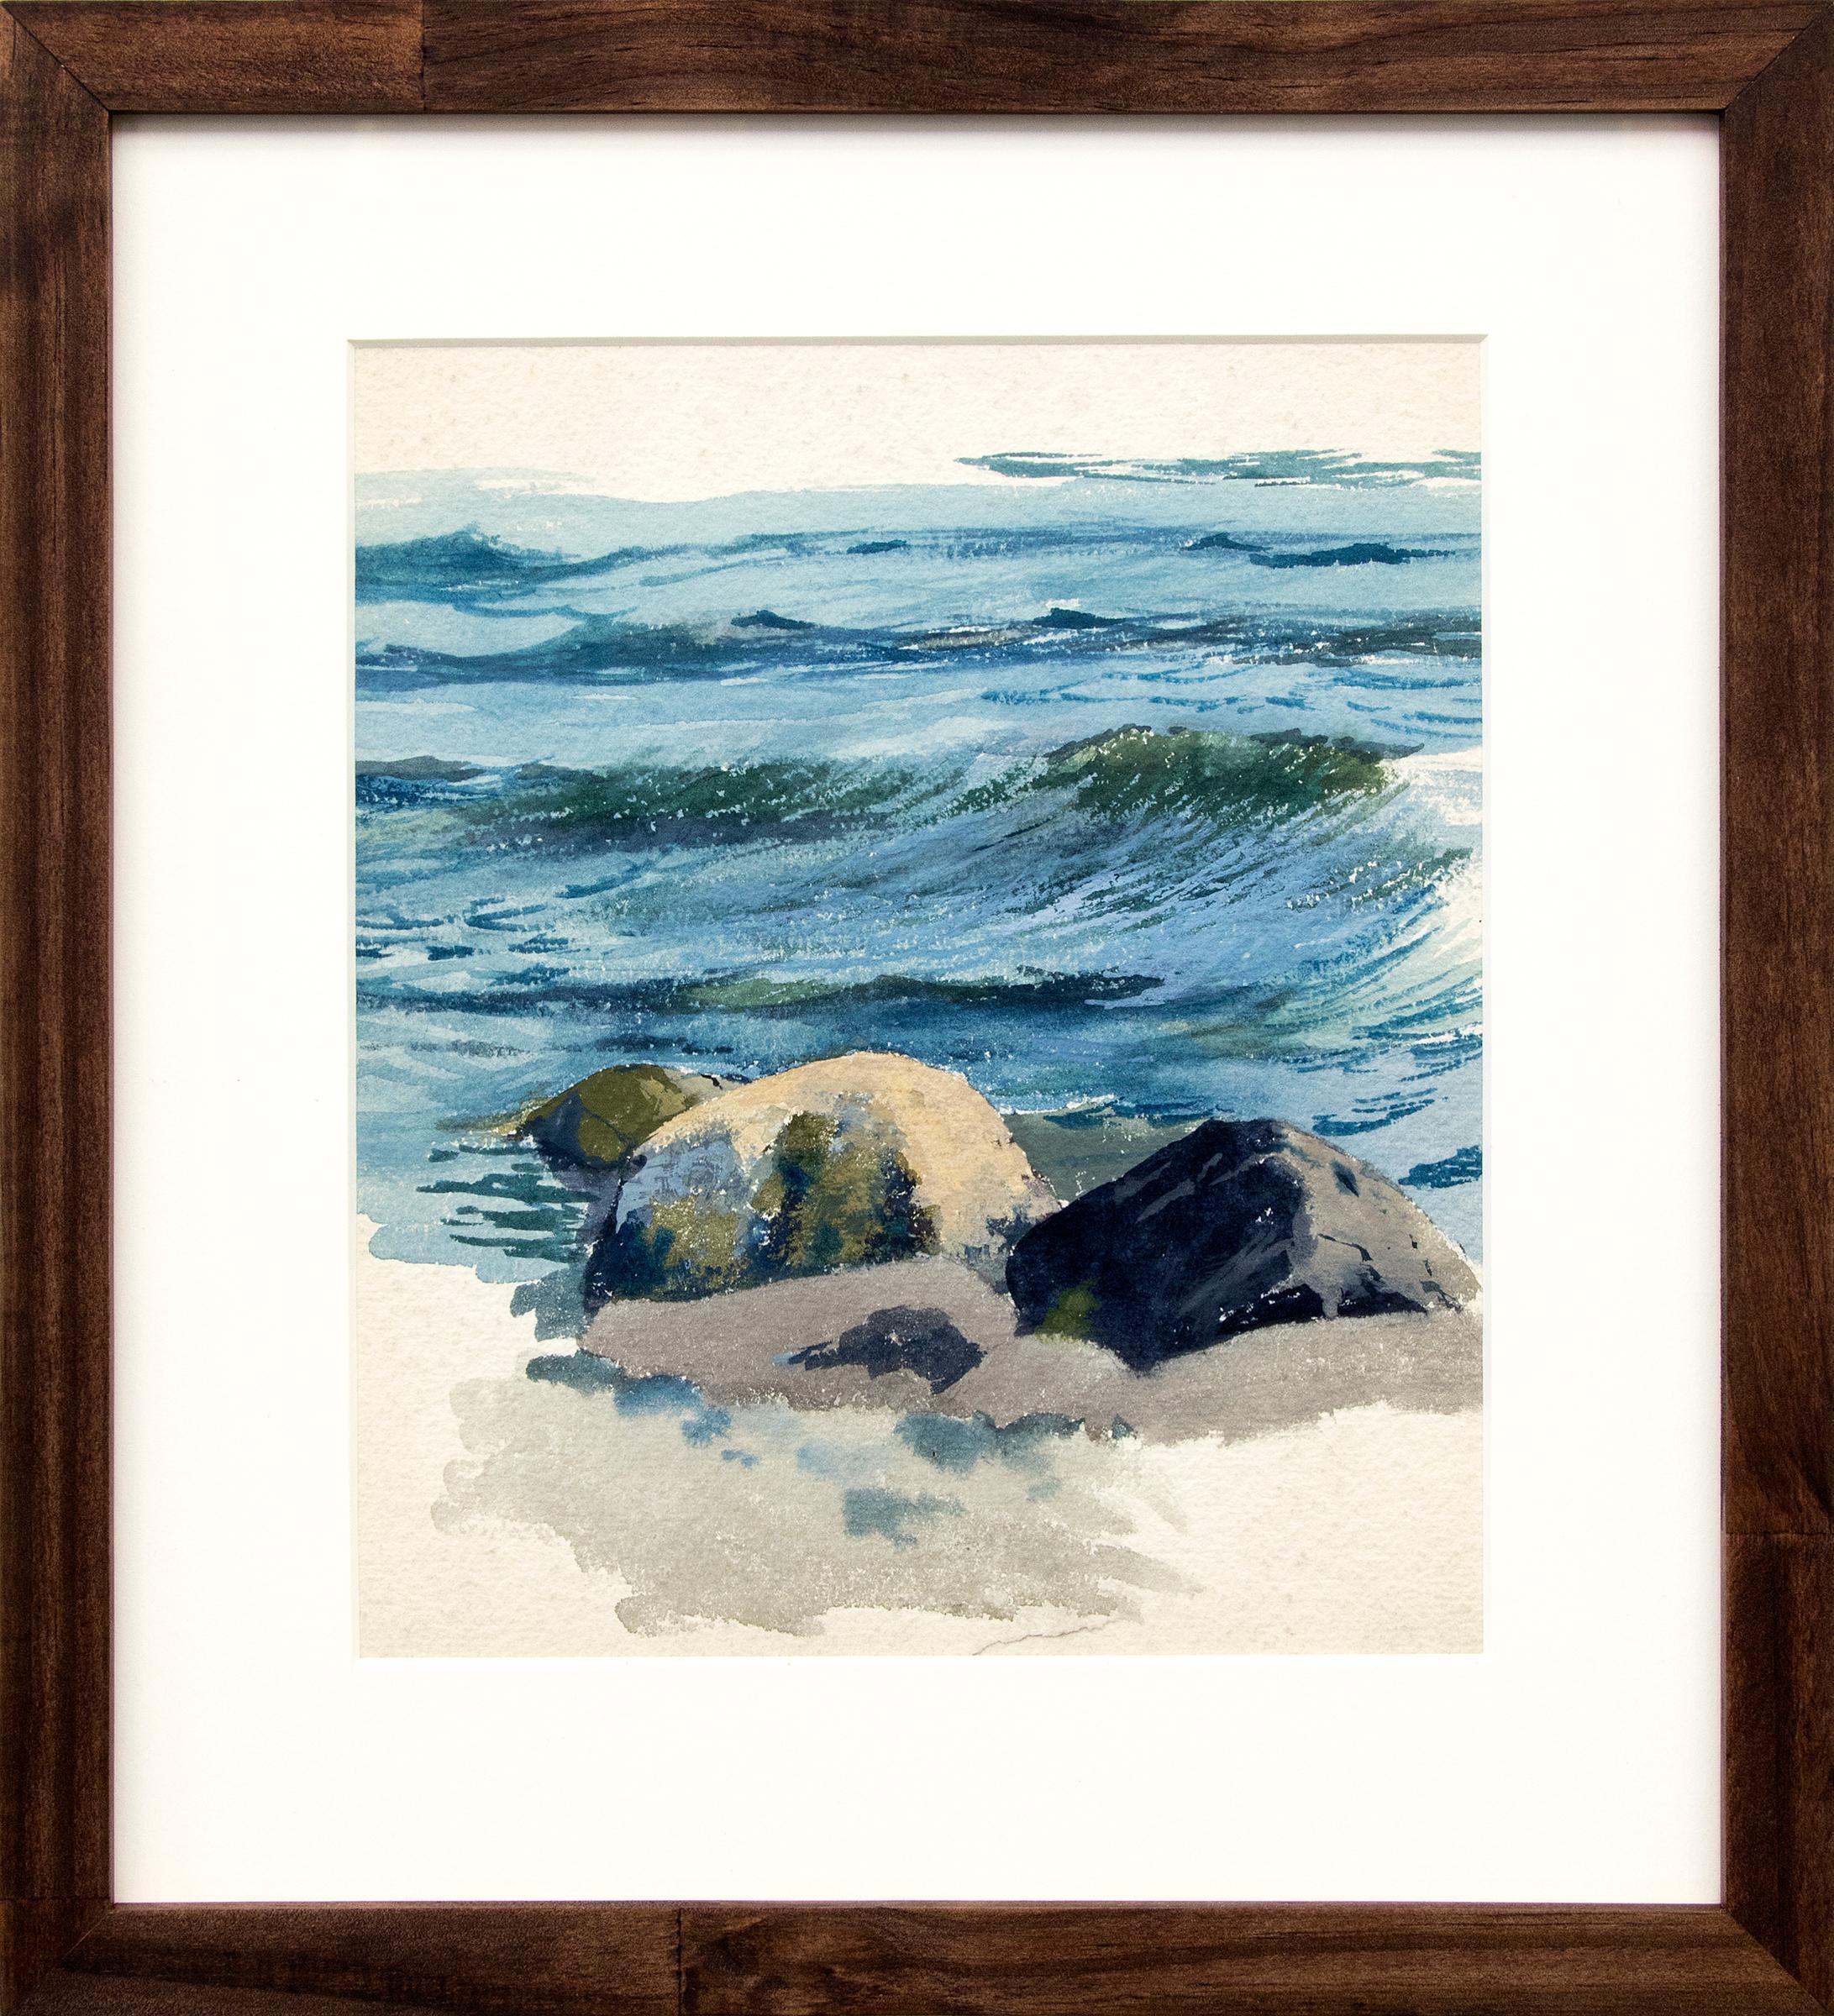 Waves and Rocks, California Coast, Vintage Circa 1920 Seascape,  Blue Gray Green